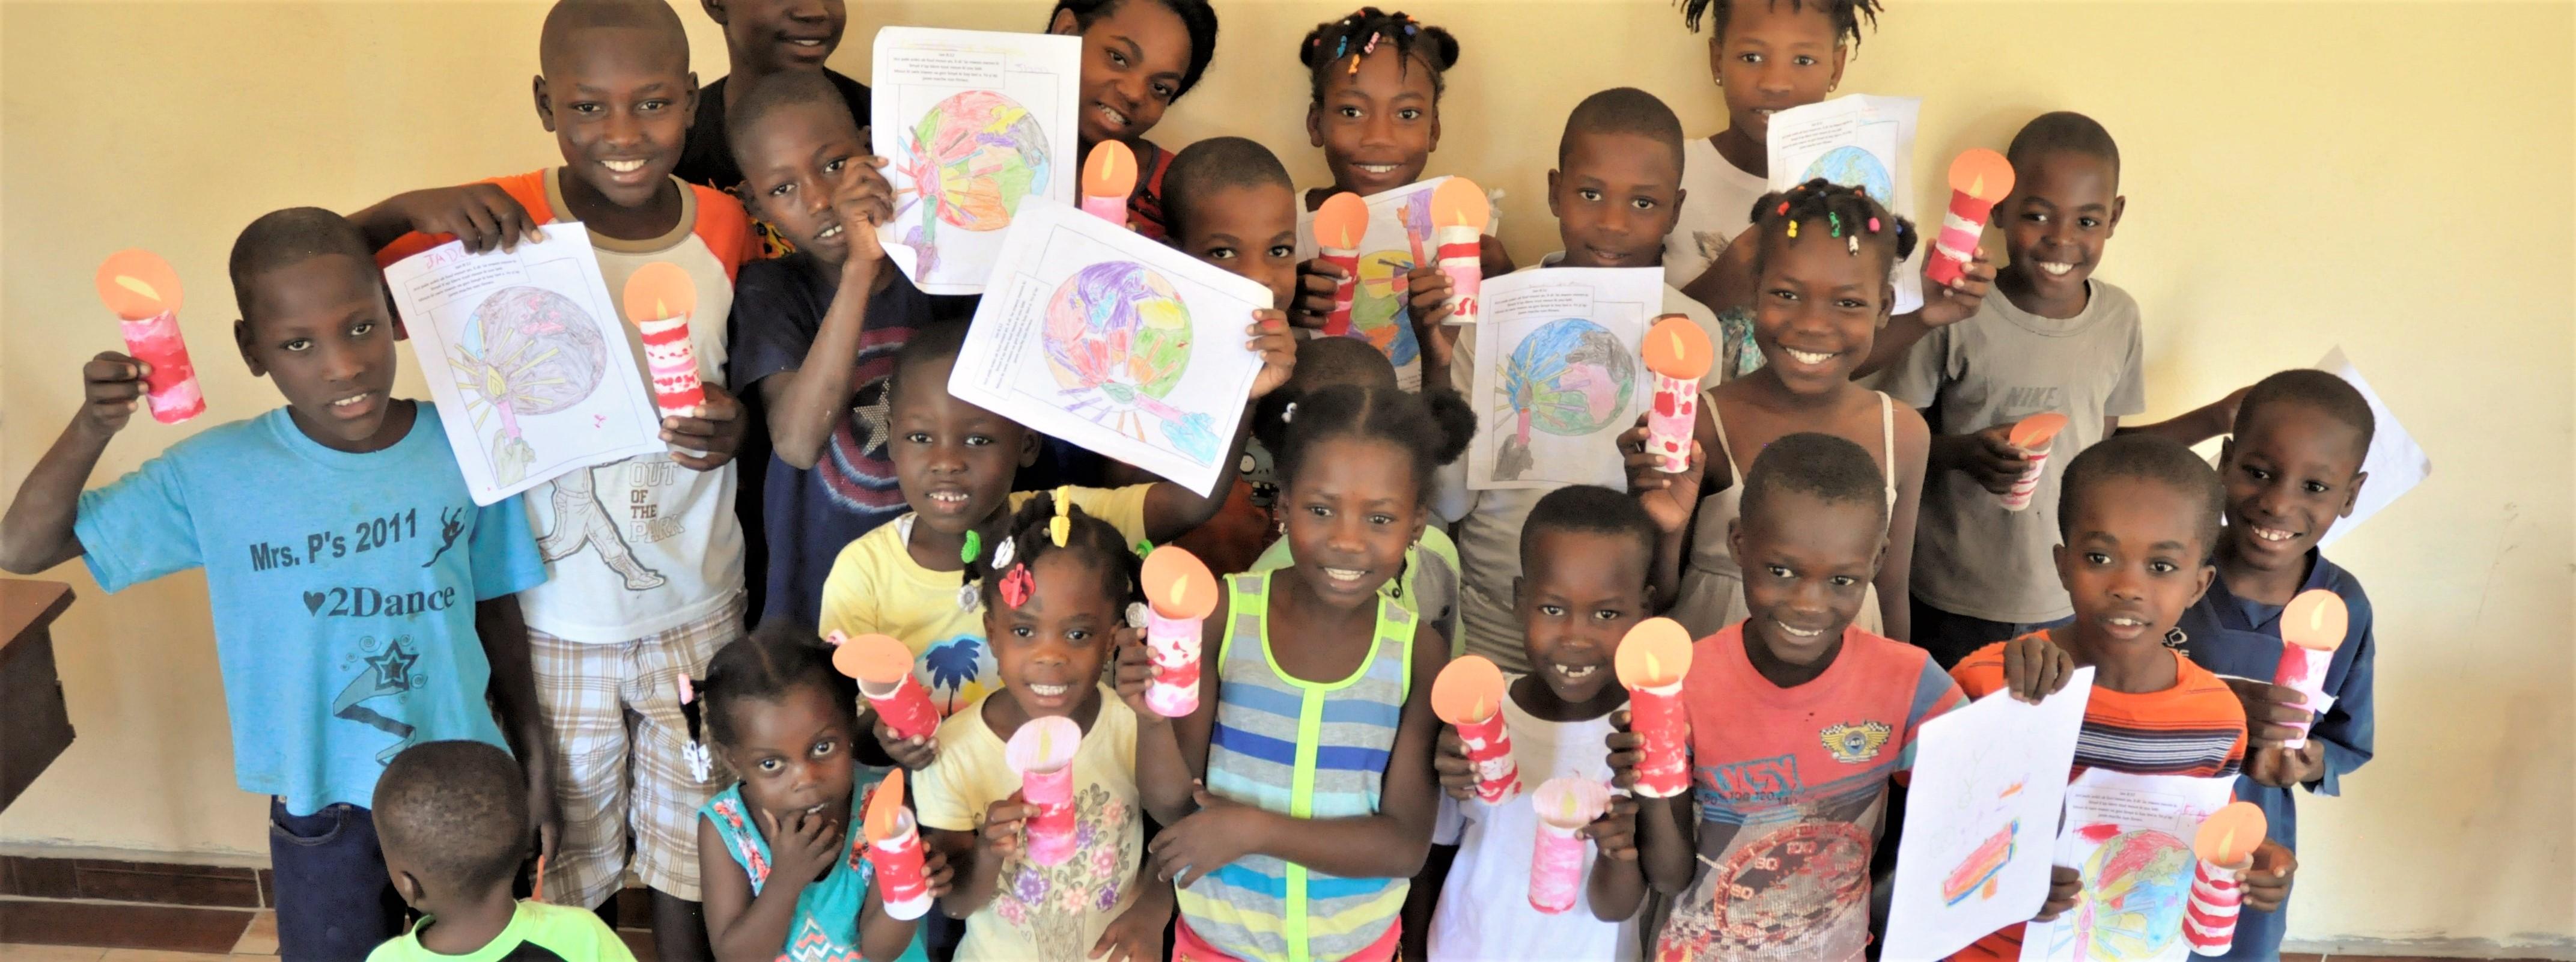 Haiti School Jesus Light of the World